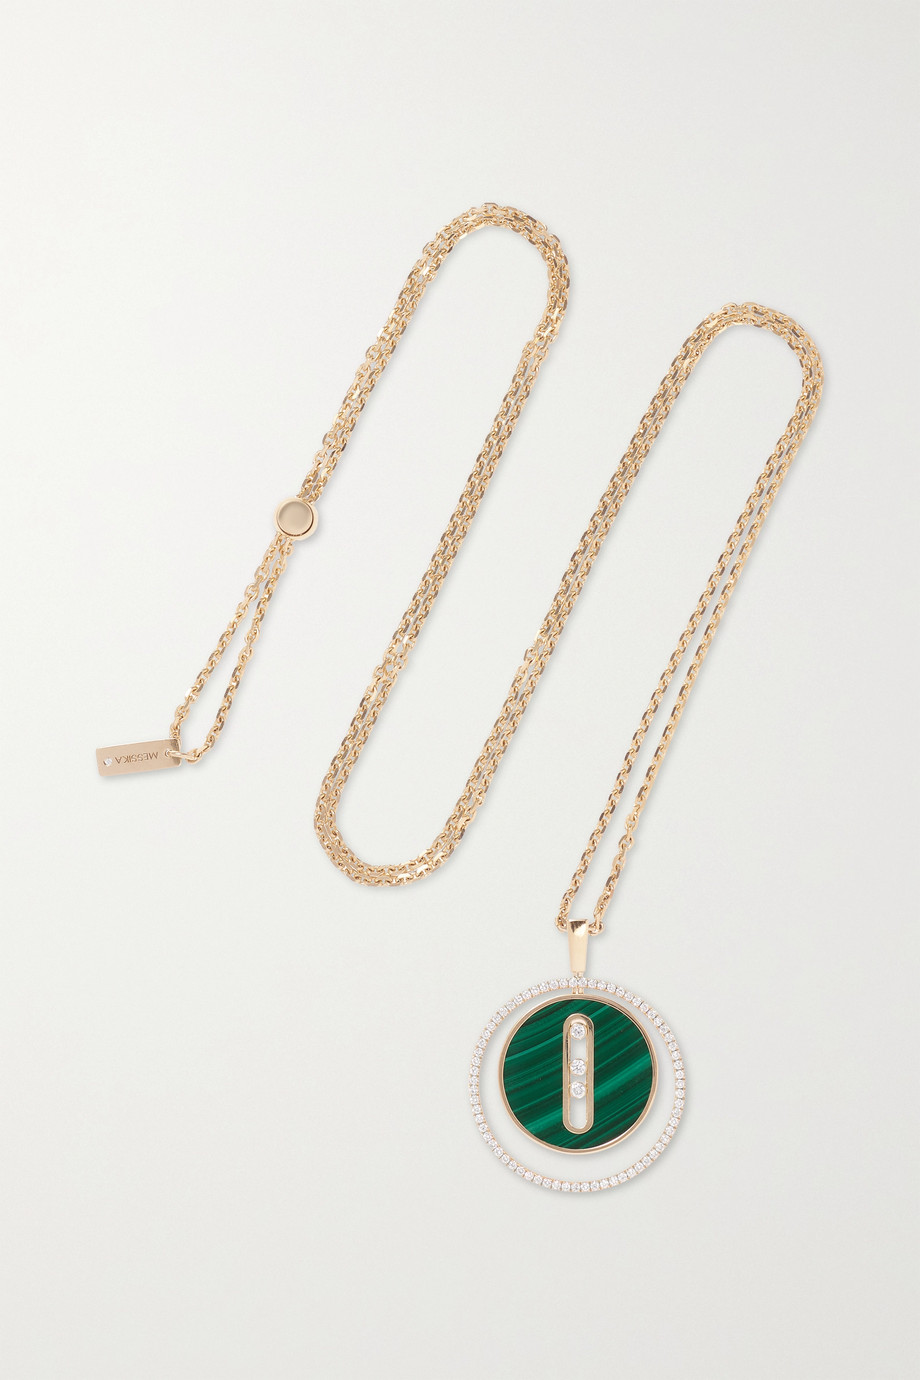 Messika Collier en or 18 carats, malachite et diamants Lucky Move